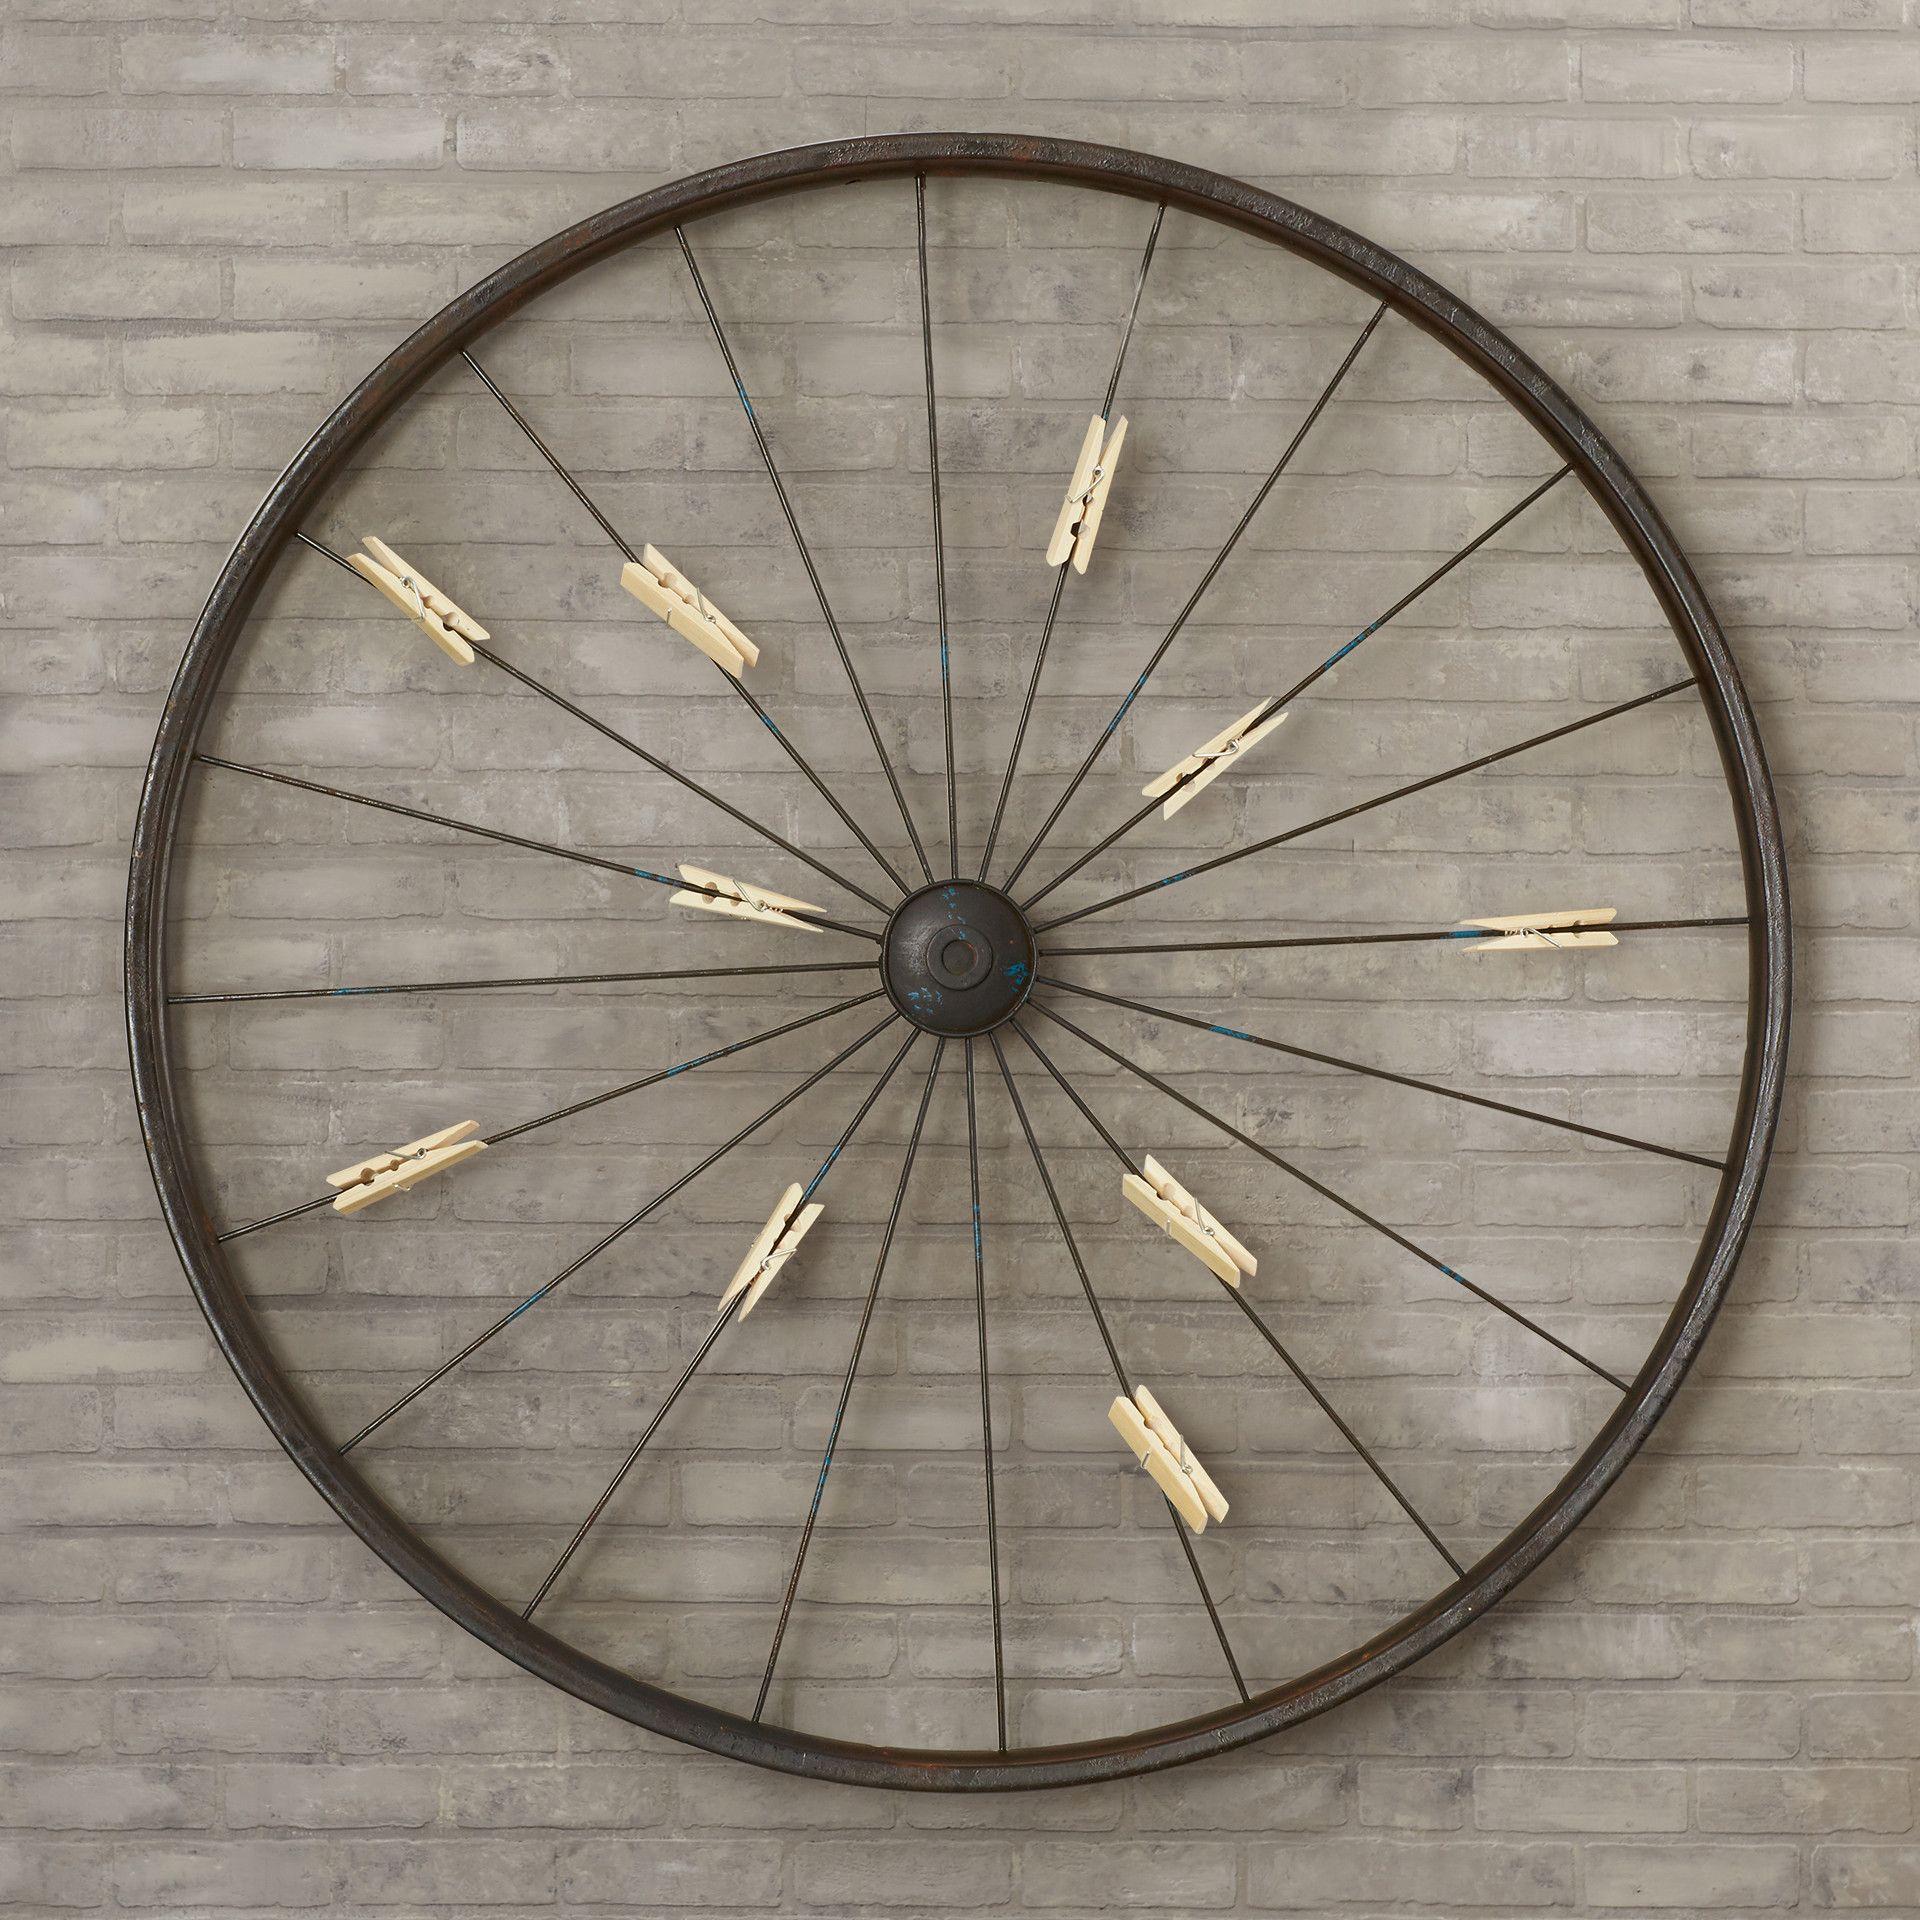 Millanocket Metal Wheel Photo Holder Wall Decor | Frames throughout Millanocket Metal Wheel Photo Holder Wall Decor (Image 25 of 30)